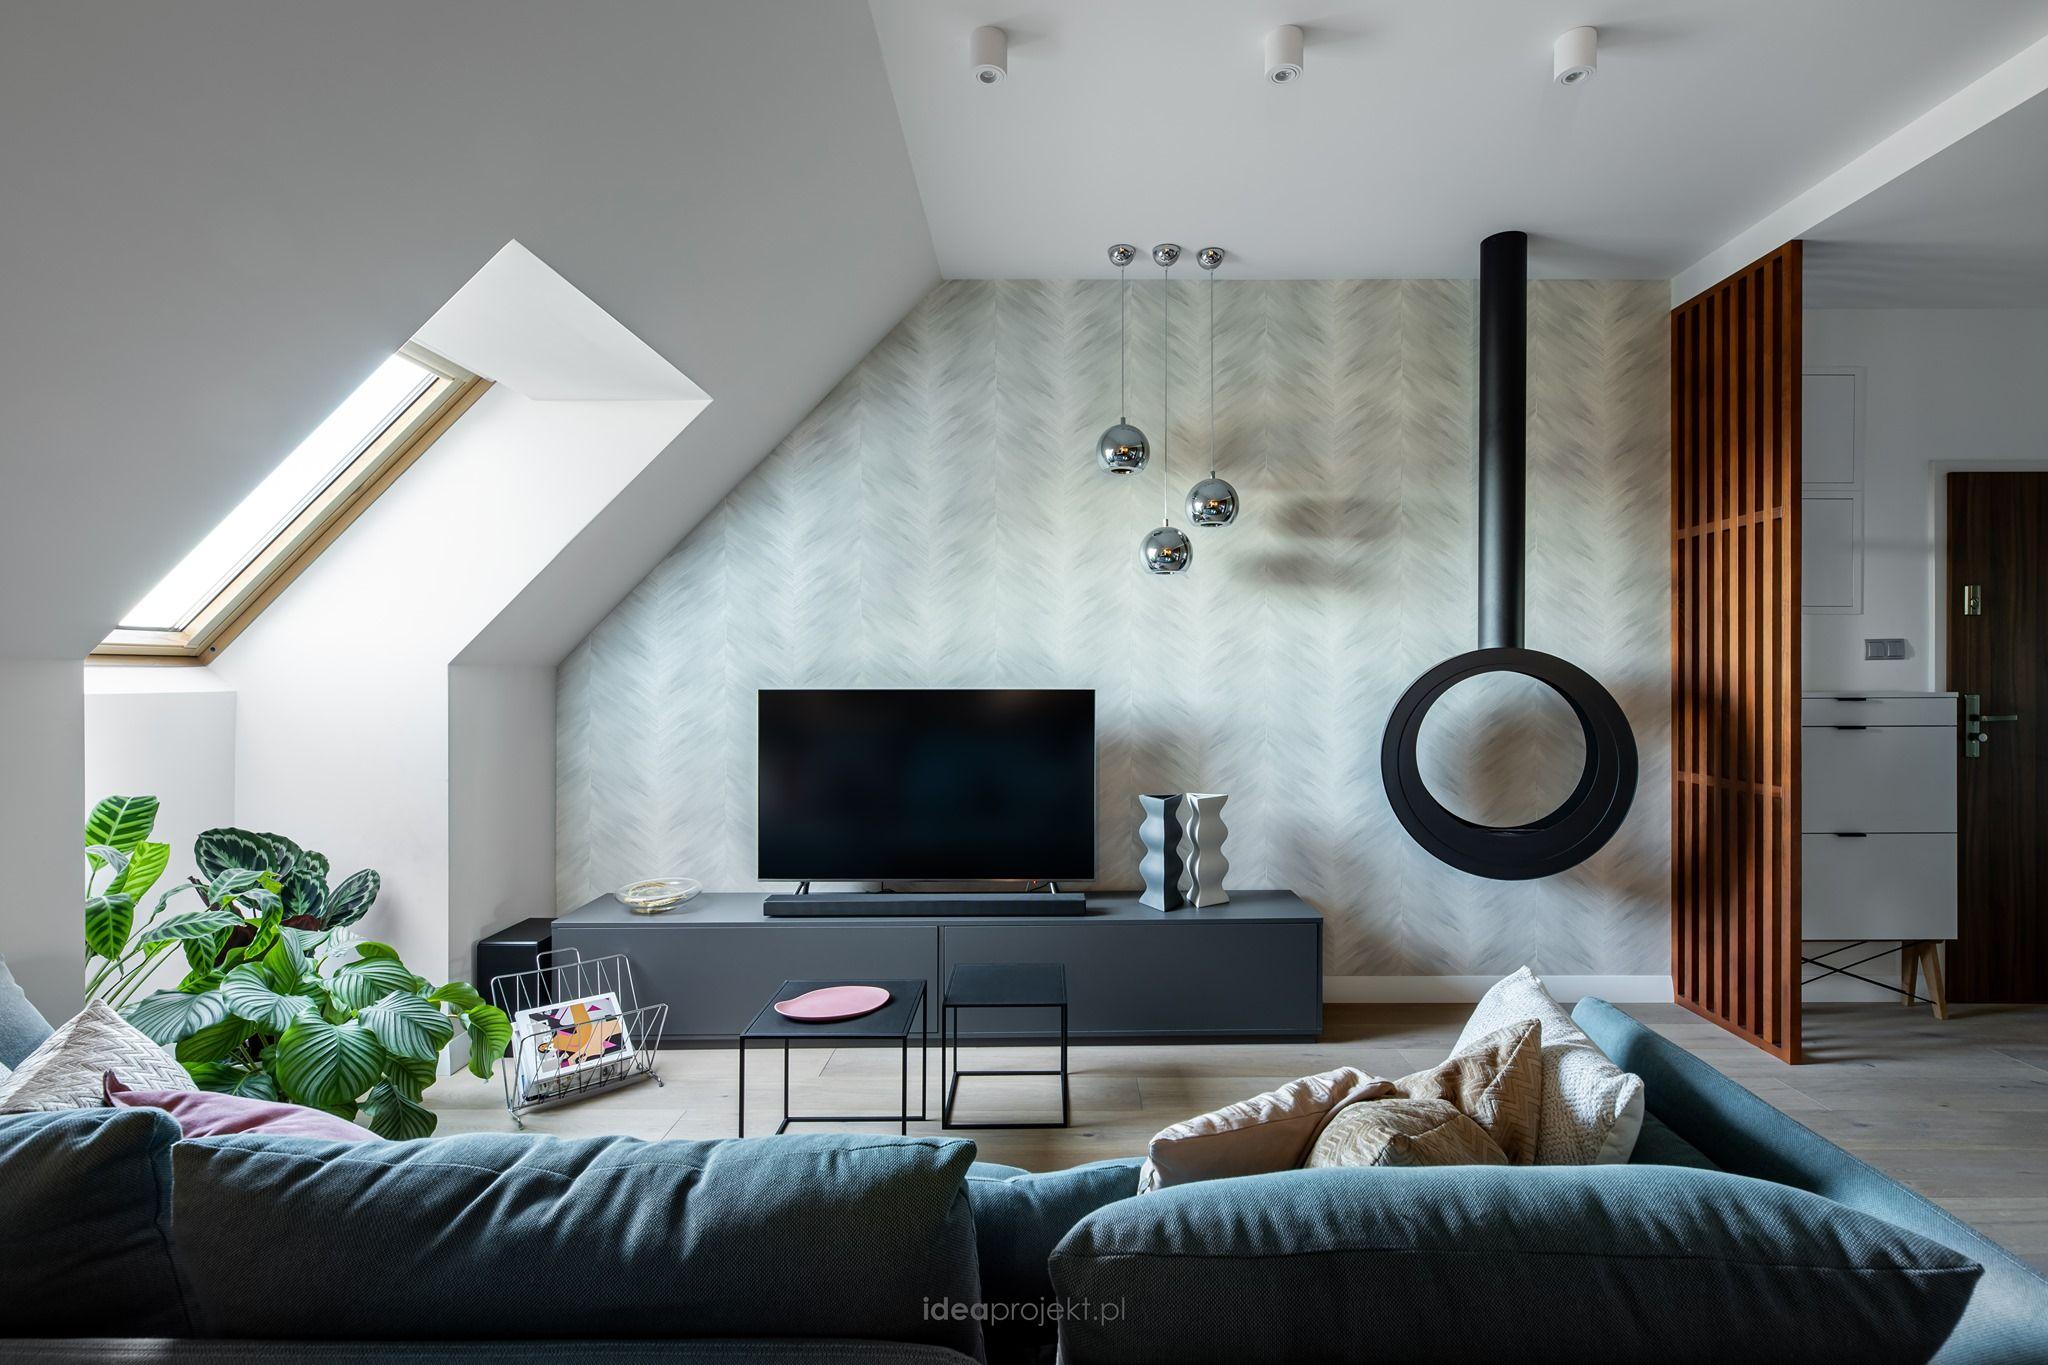 Pin by Anna Ch on +LIVINGROOM+   Living room, Flat screen, Tvs